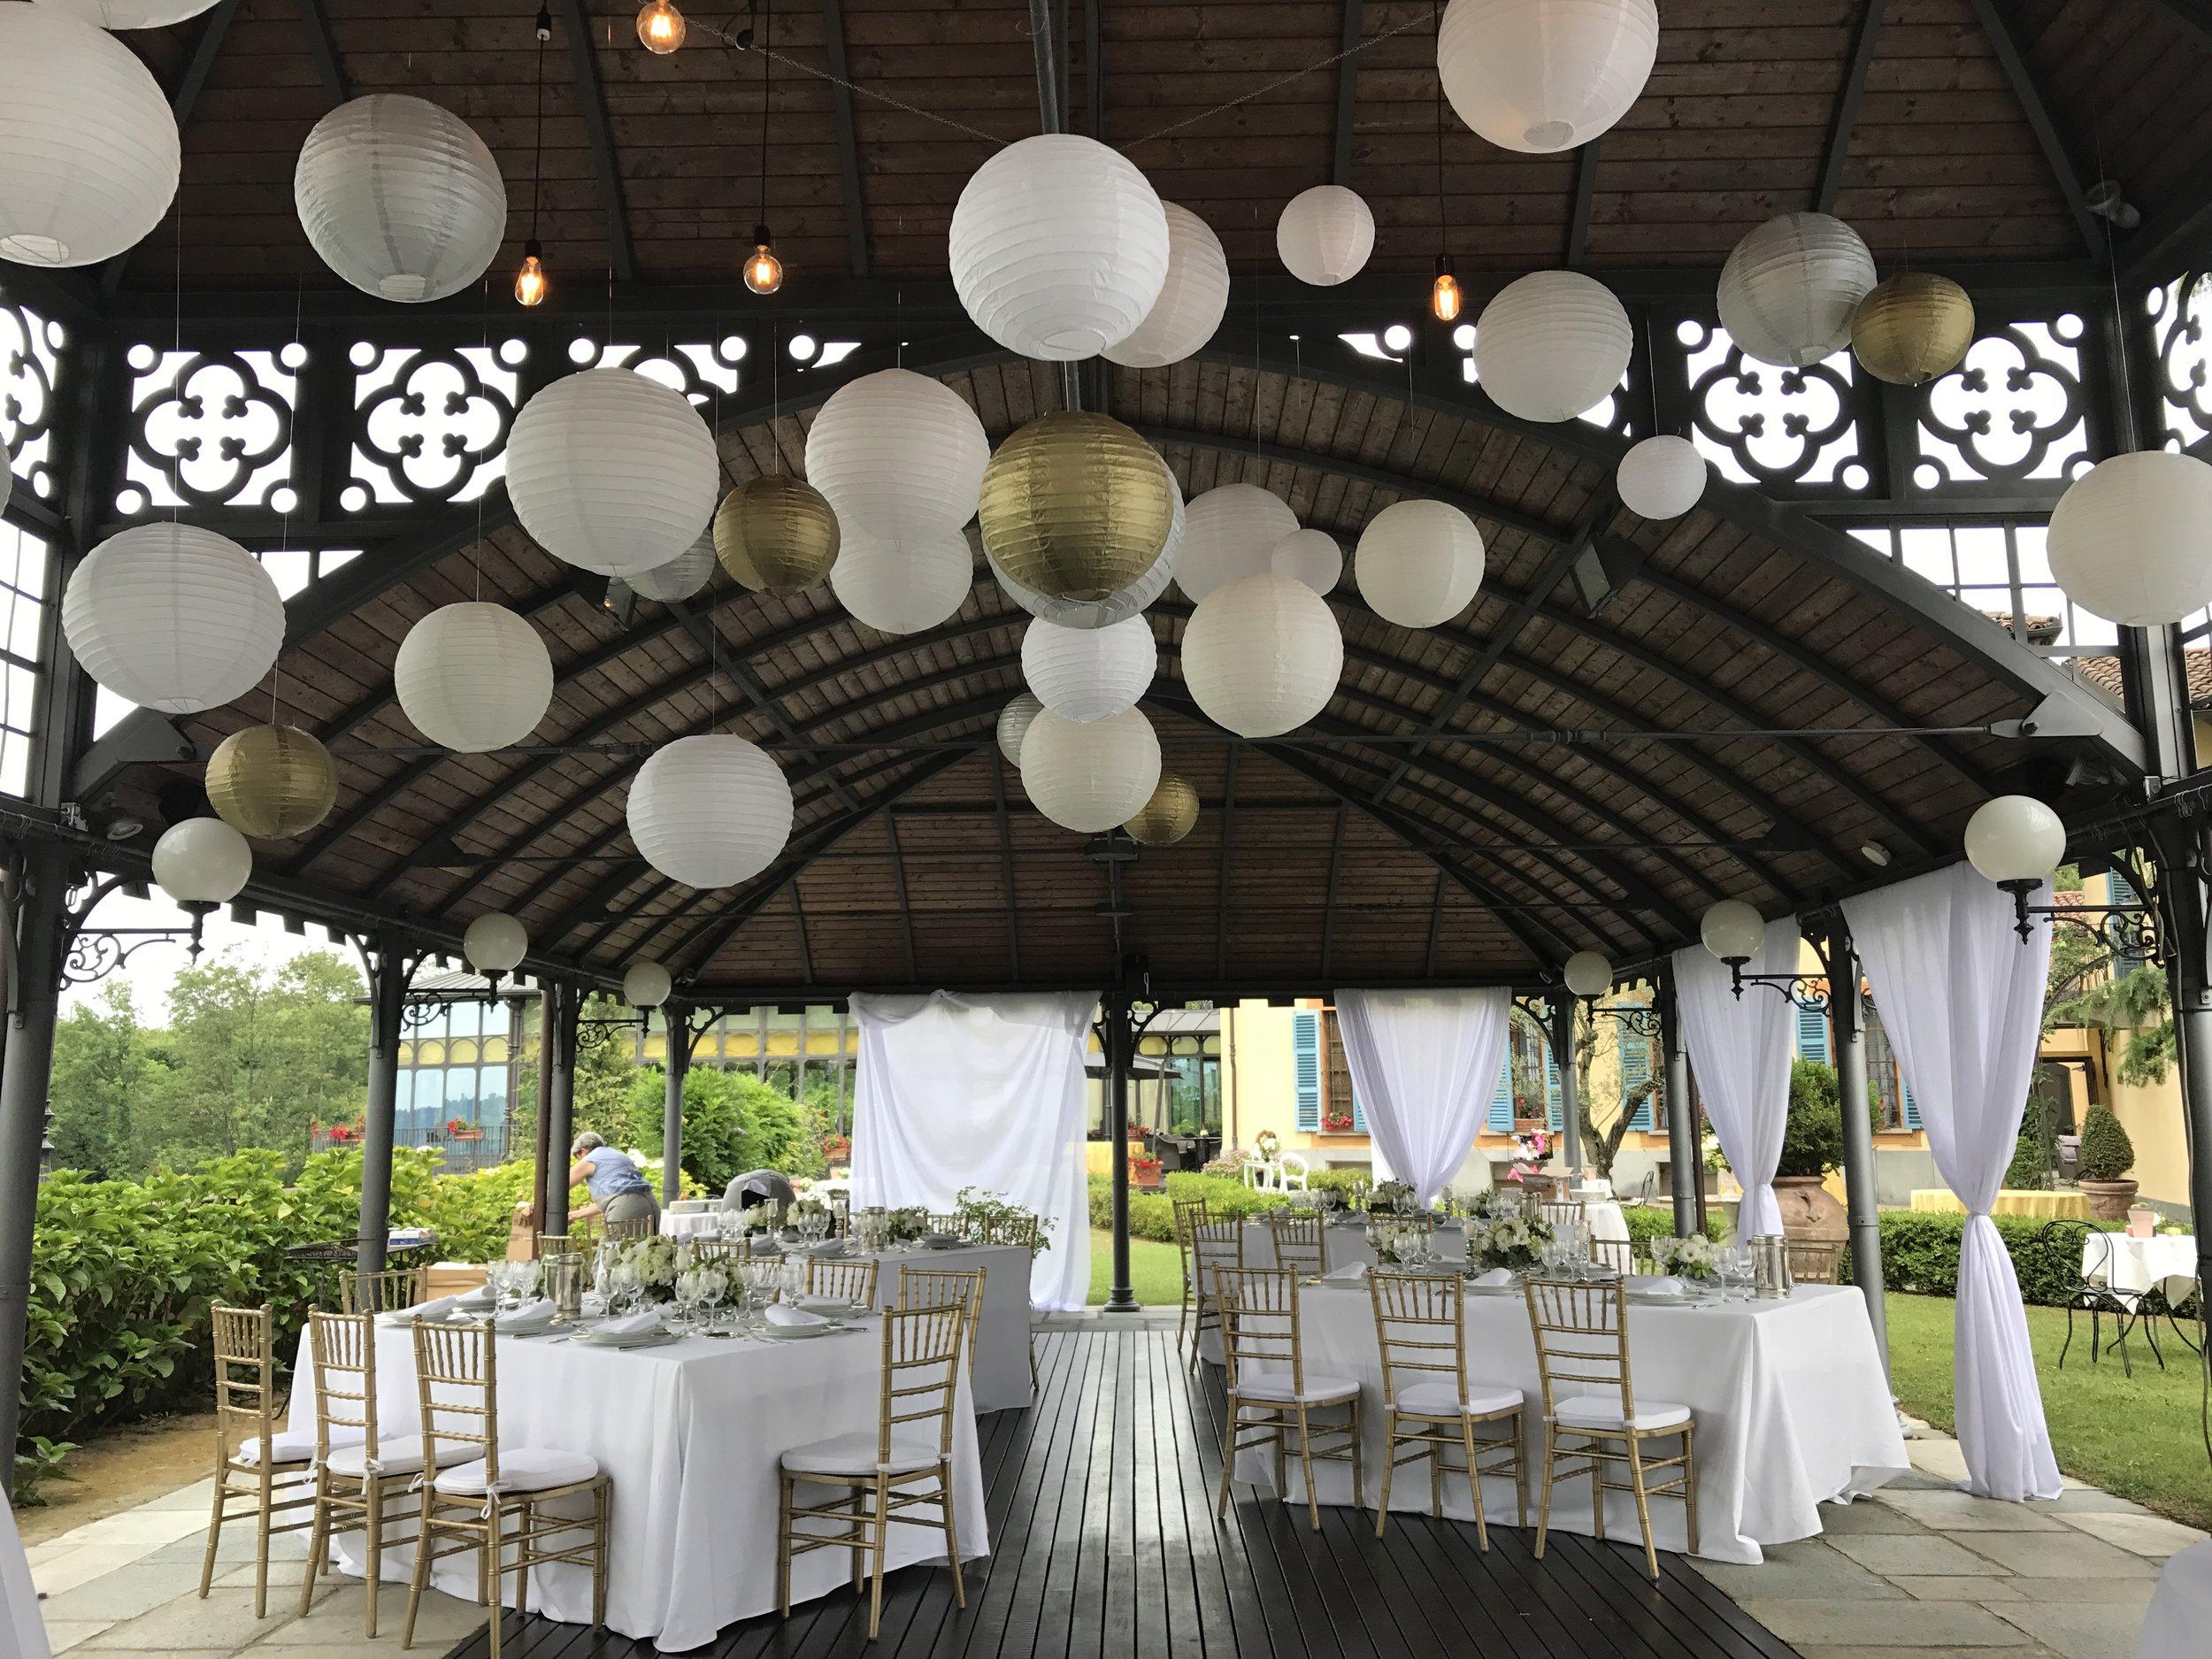 alex-edge-destination-wedding-italy-5.JPG